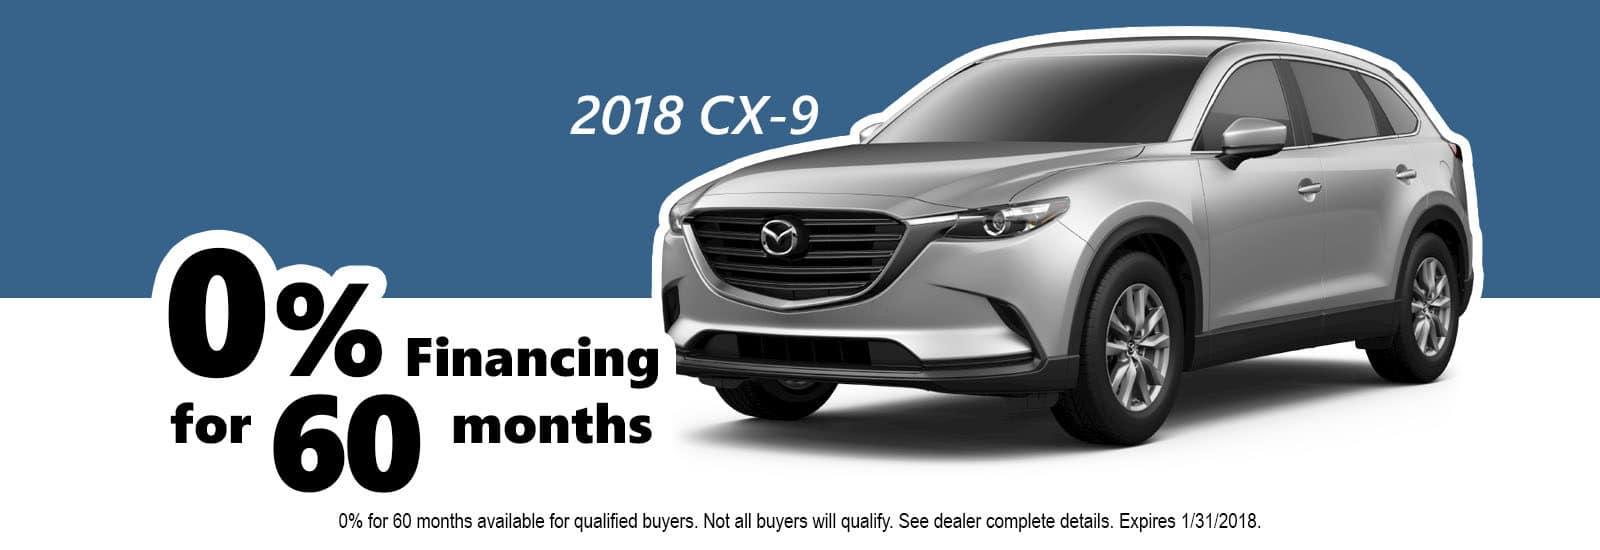 Mazda_PricePoint_Sliders_1600x550_CX-9